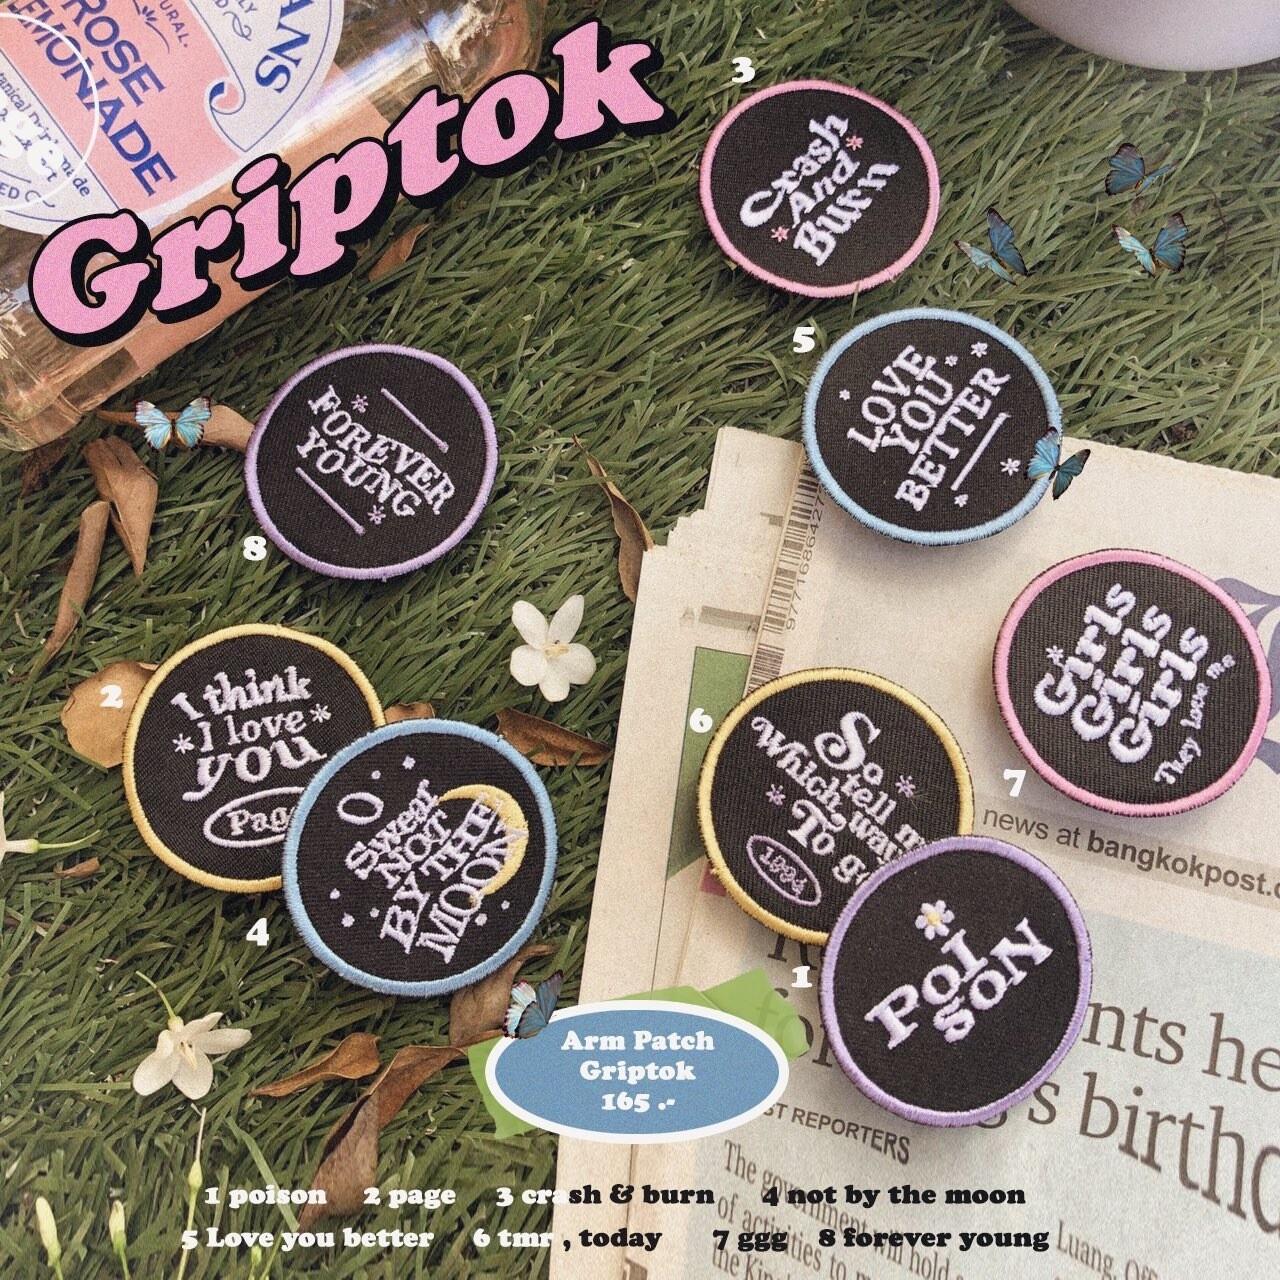 GOT7 Embroided Griptok by WGG K-Shop